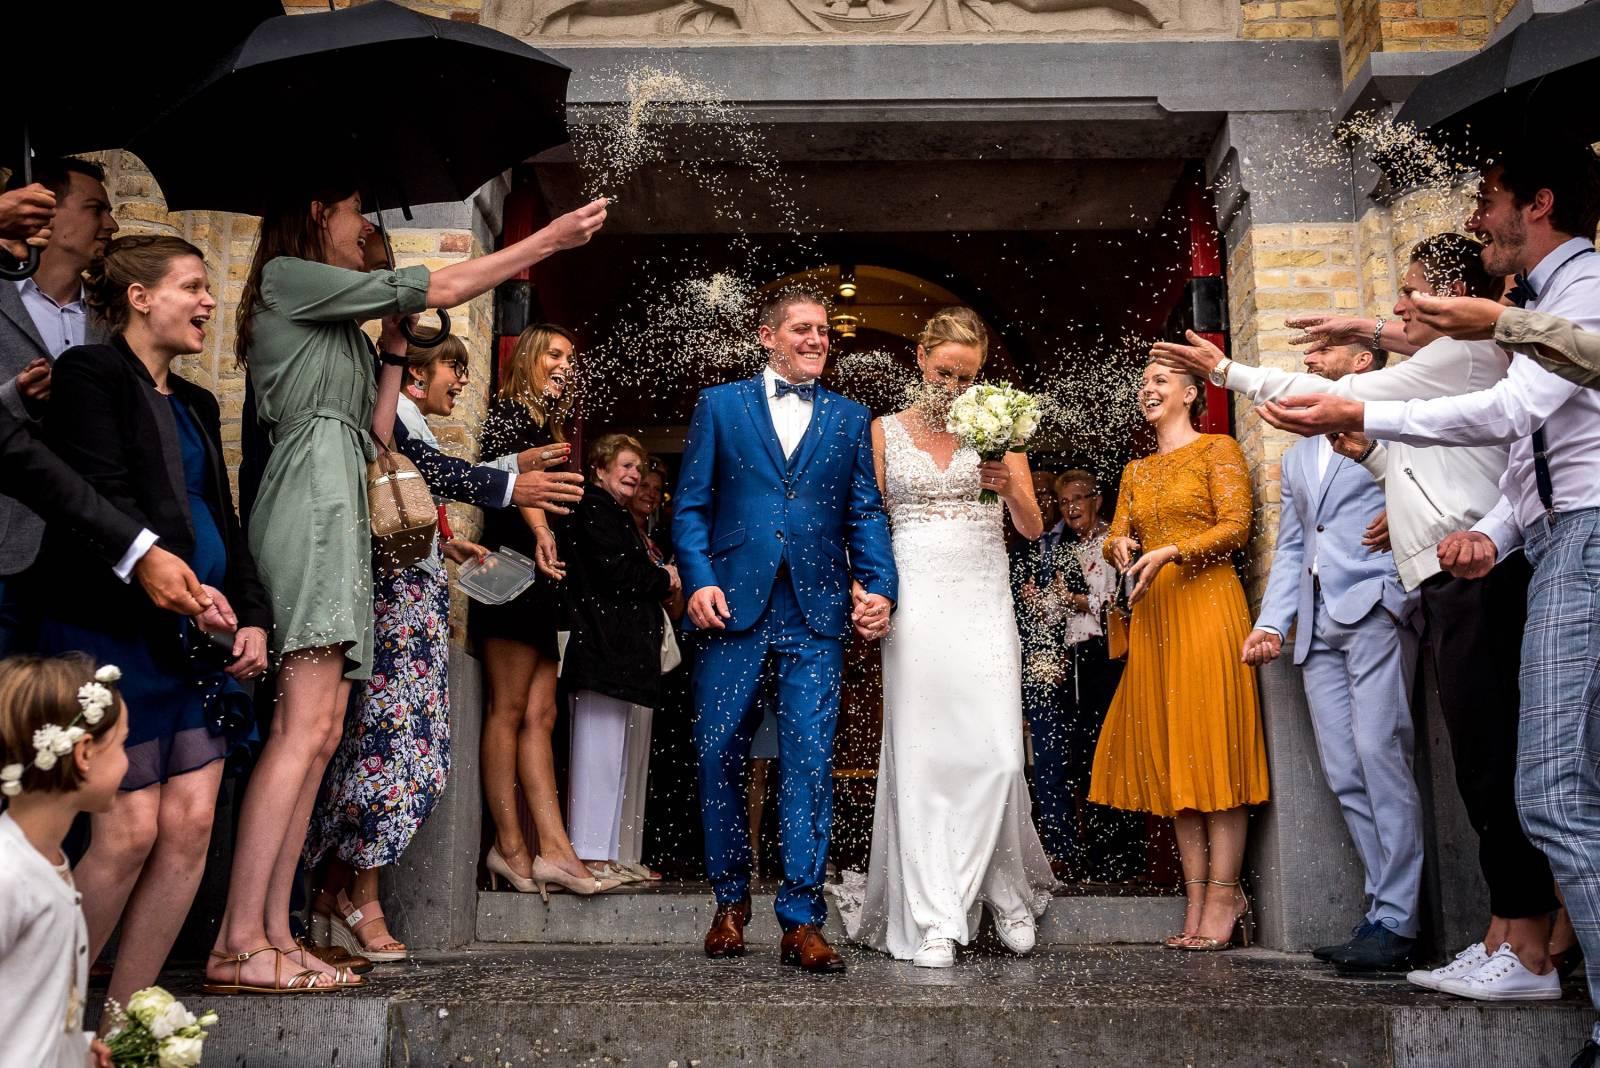 LOGO Fotografie Melody - Huwelijksfotograaf - Trouwfotograaf - House of Weddings - 4